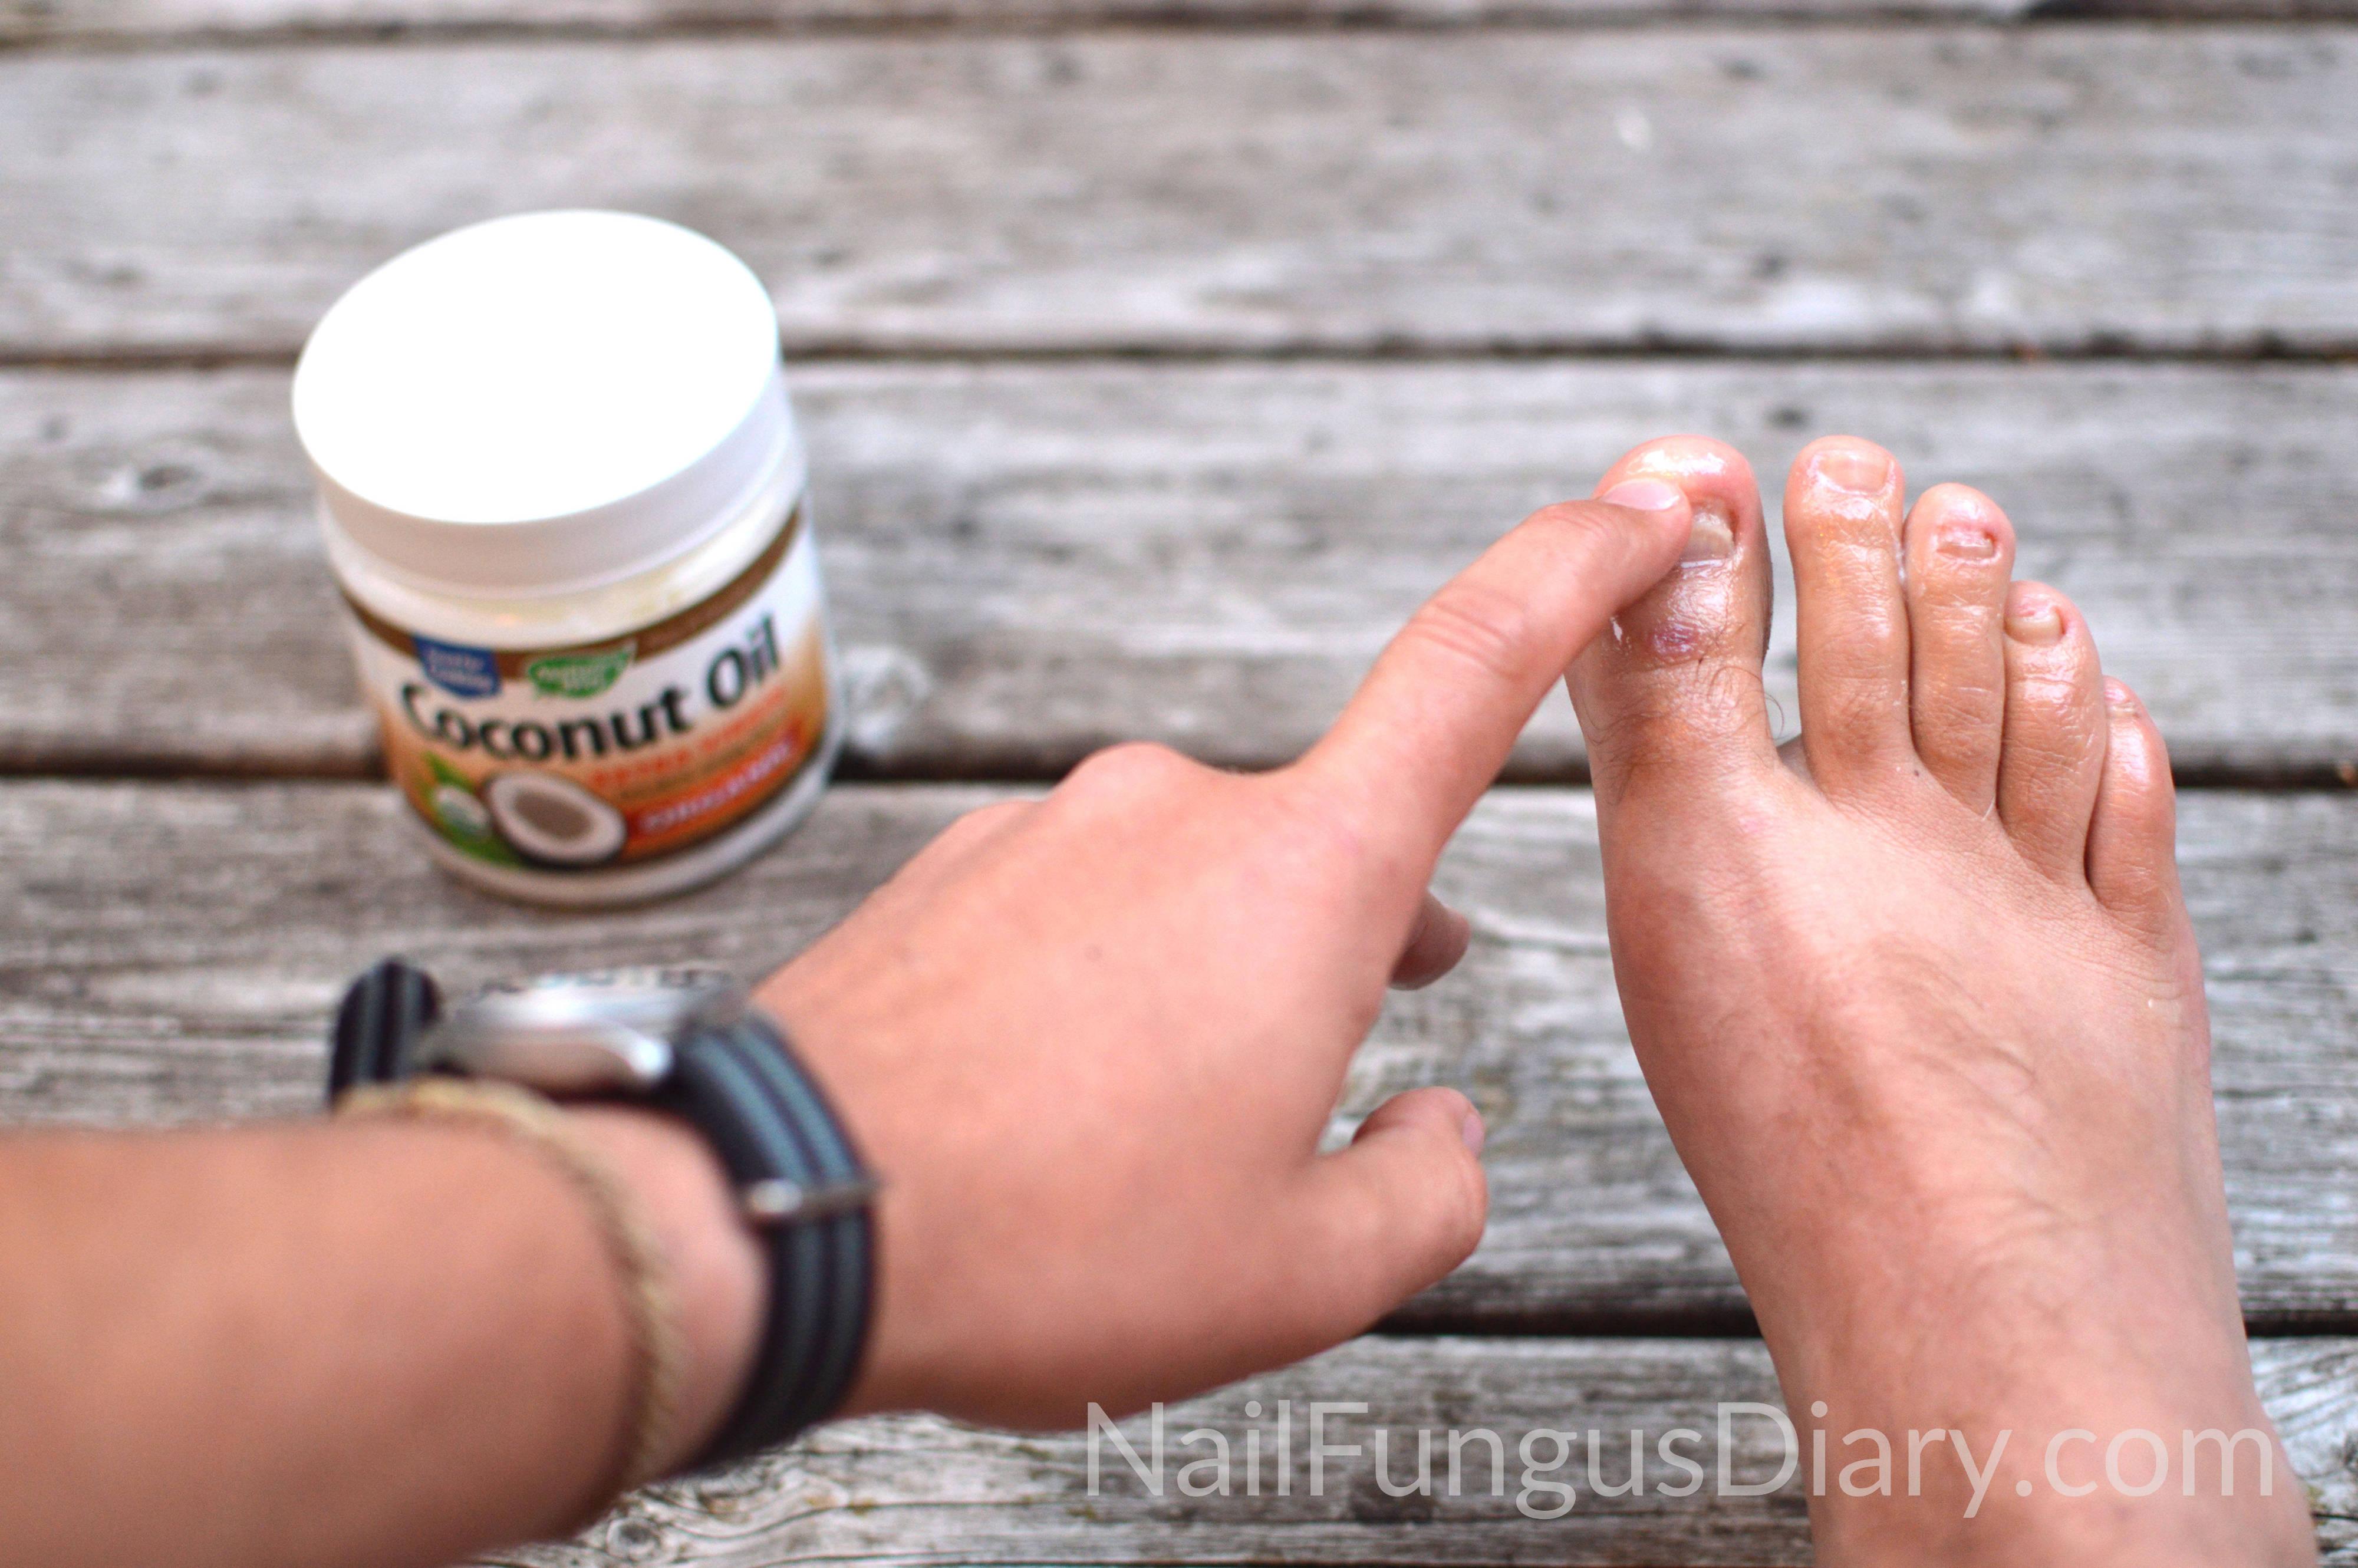 Nail Fungus Update January 2015 Nail Fungus Diary